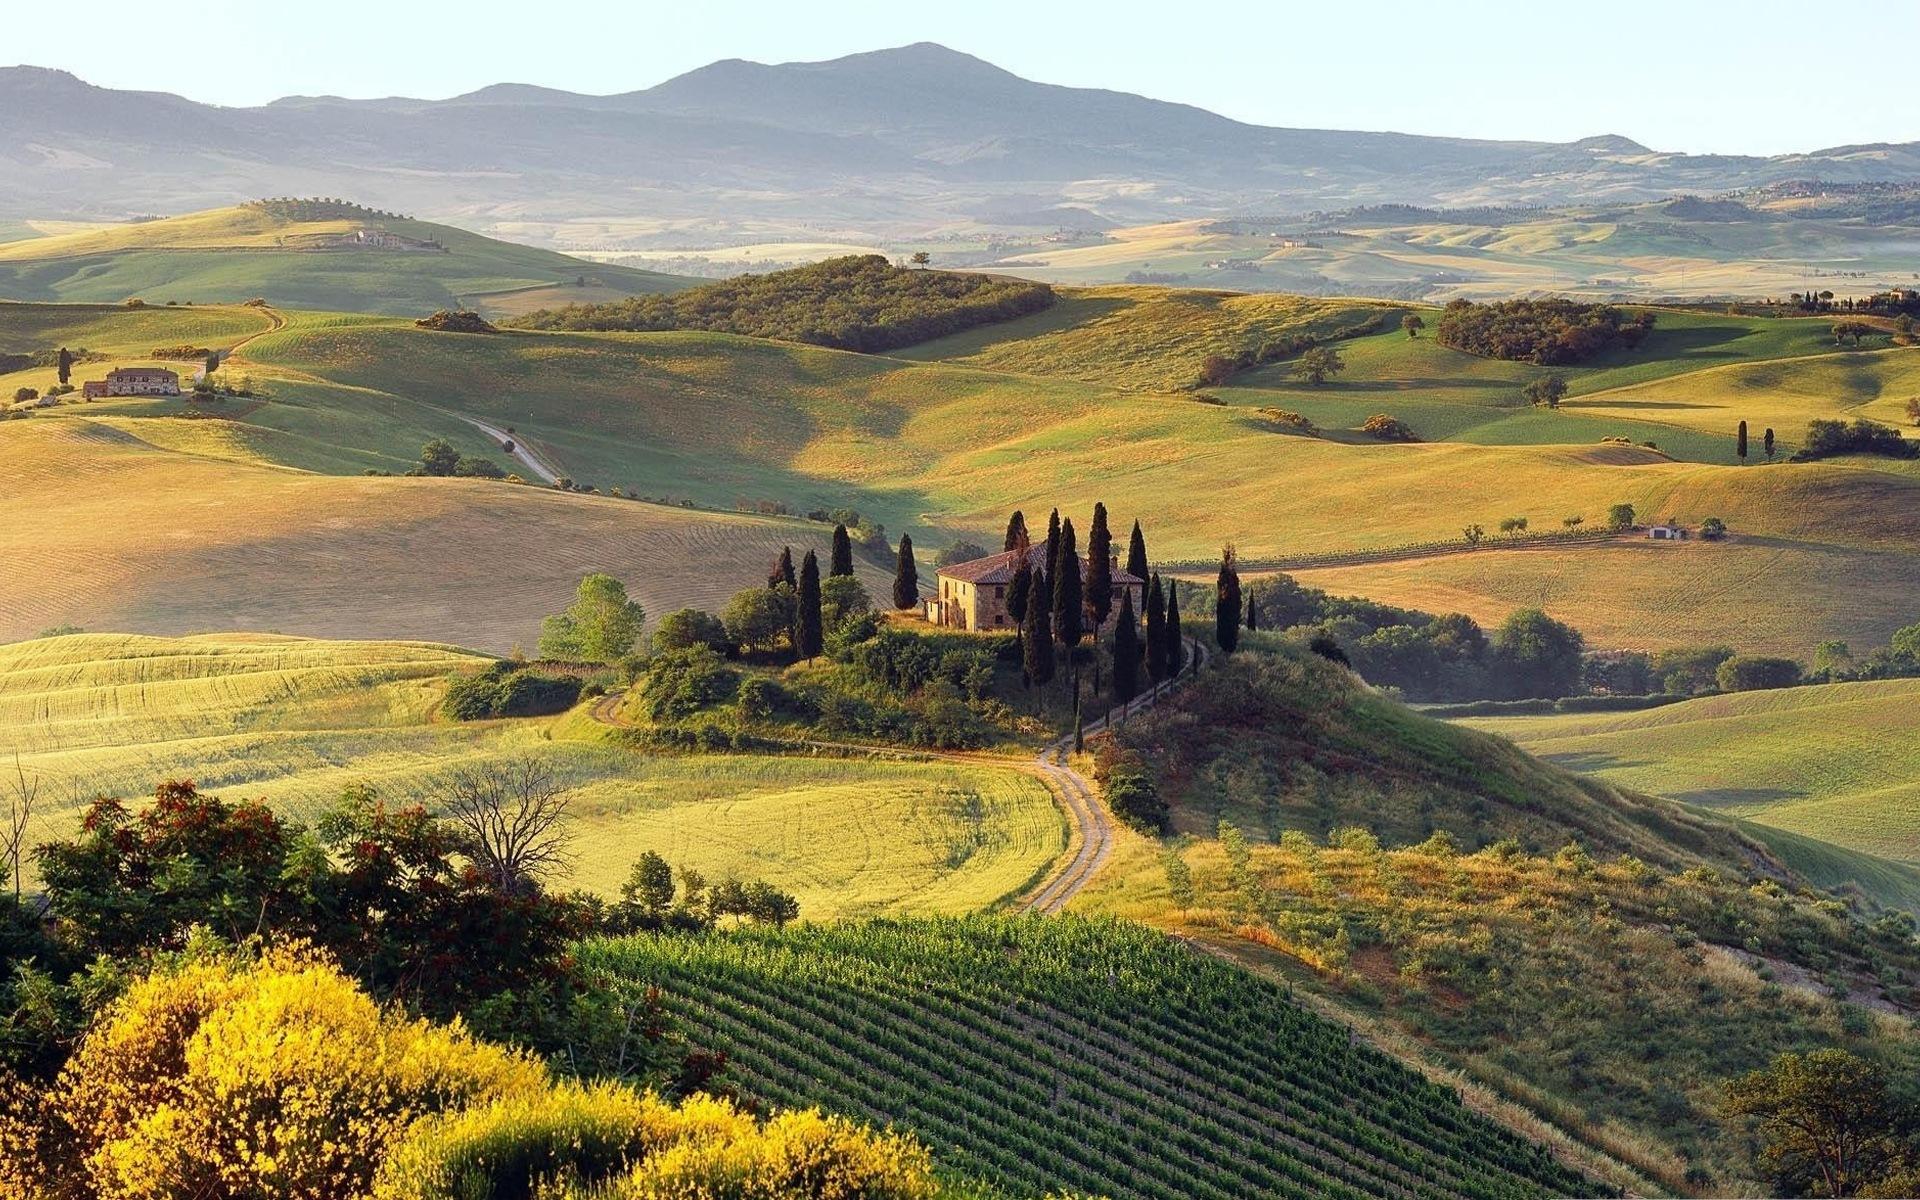 italian natural beauty scenery hd wallpaper #12 - 1920x1200